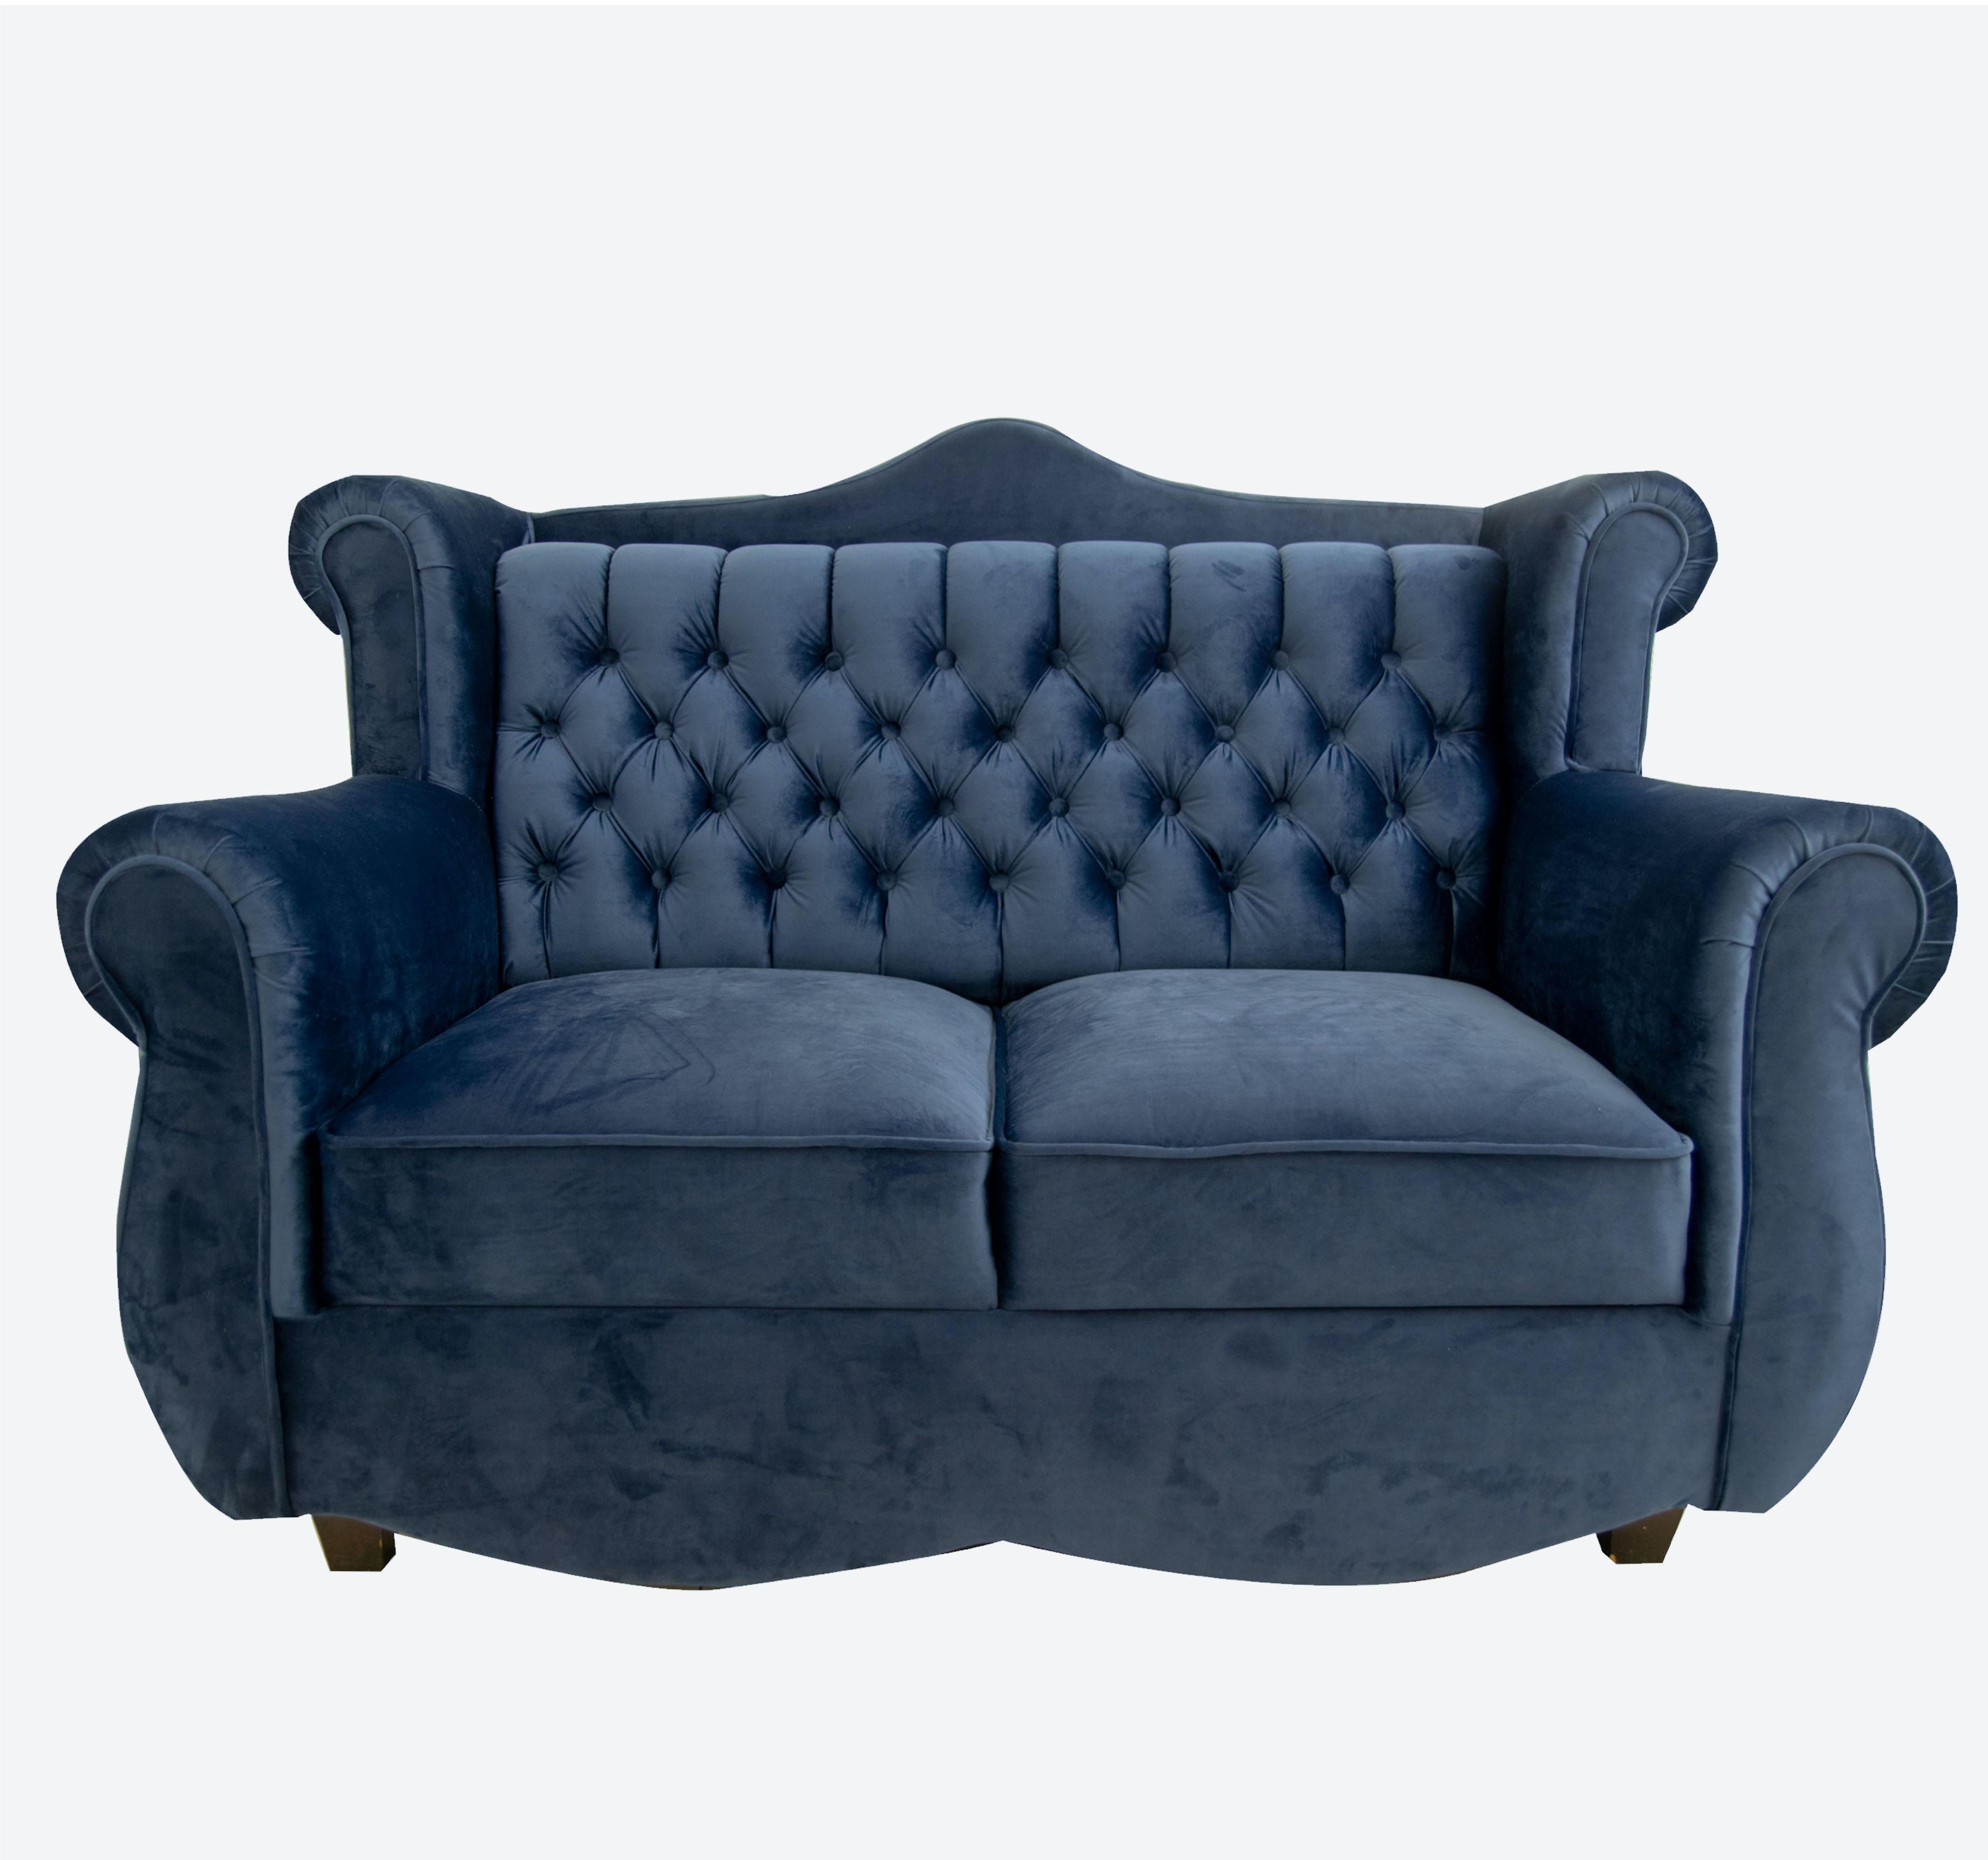 2 Seater Jaguar Bulky Sofa